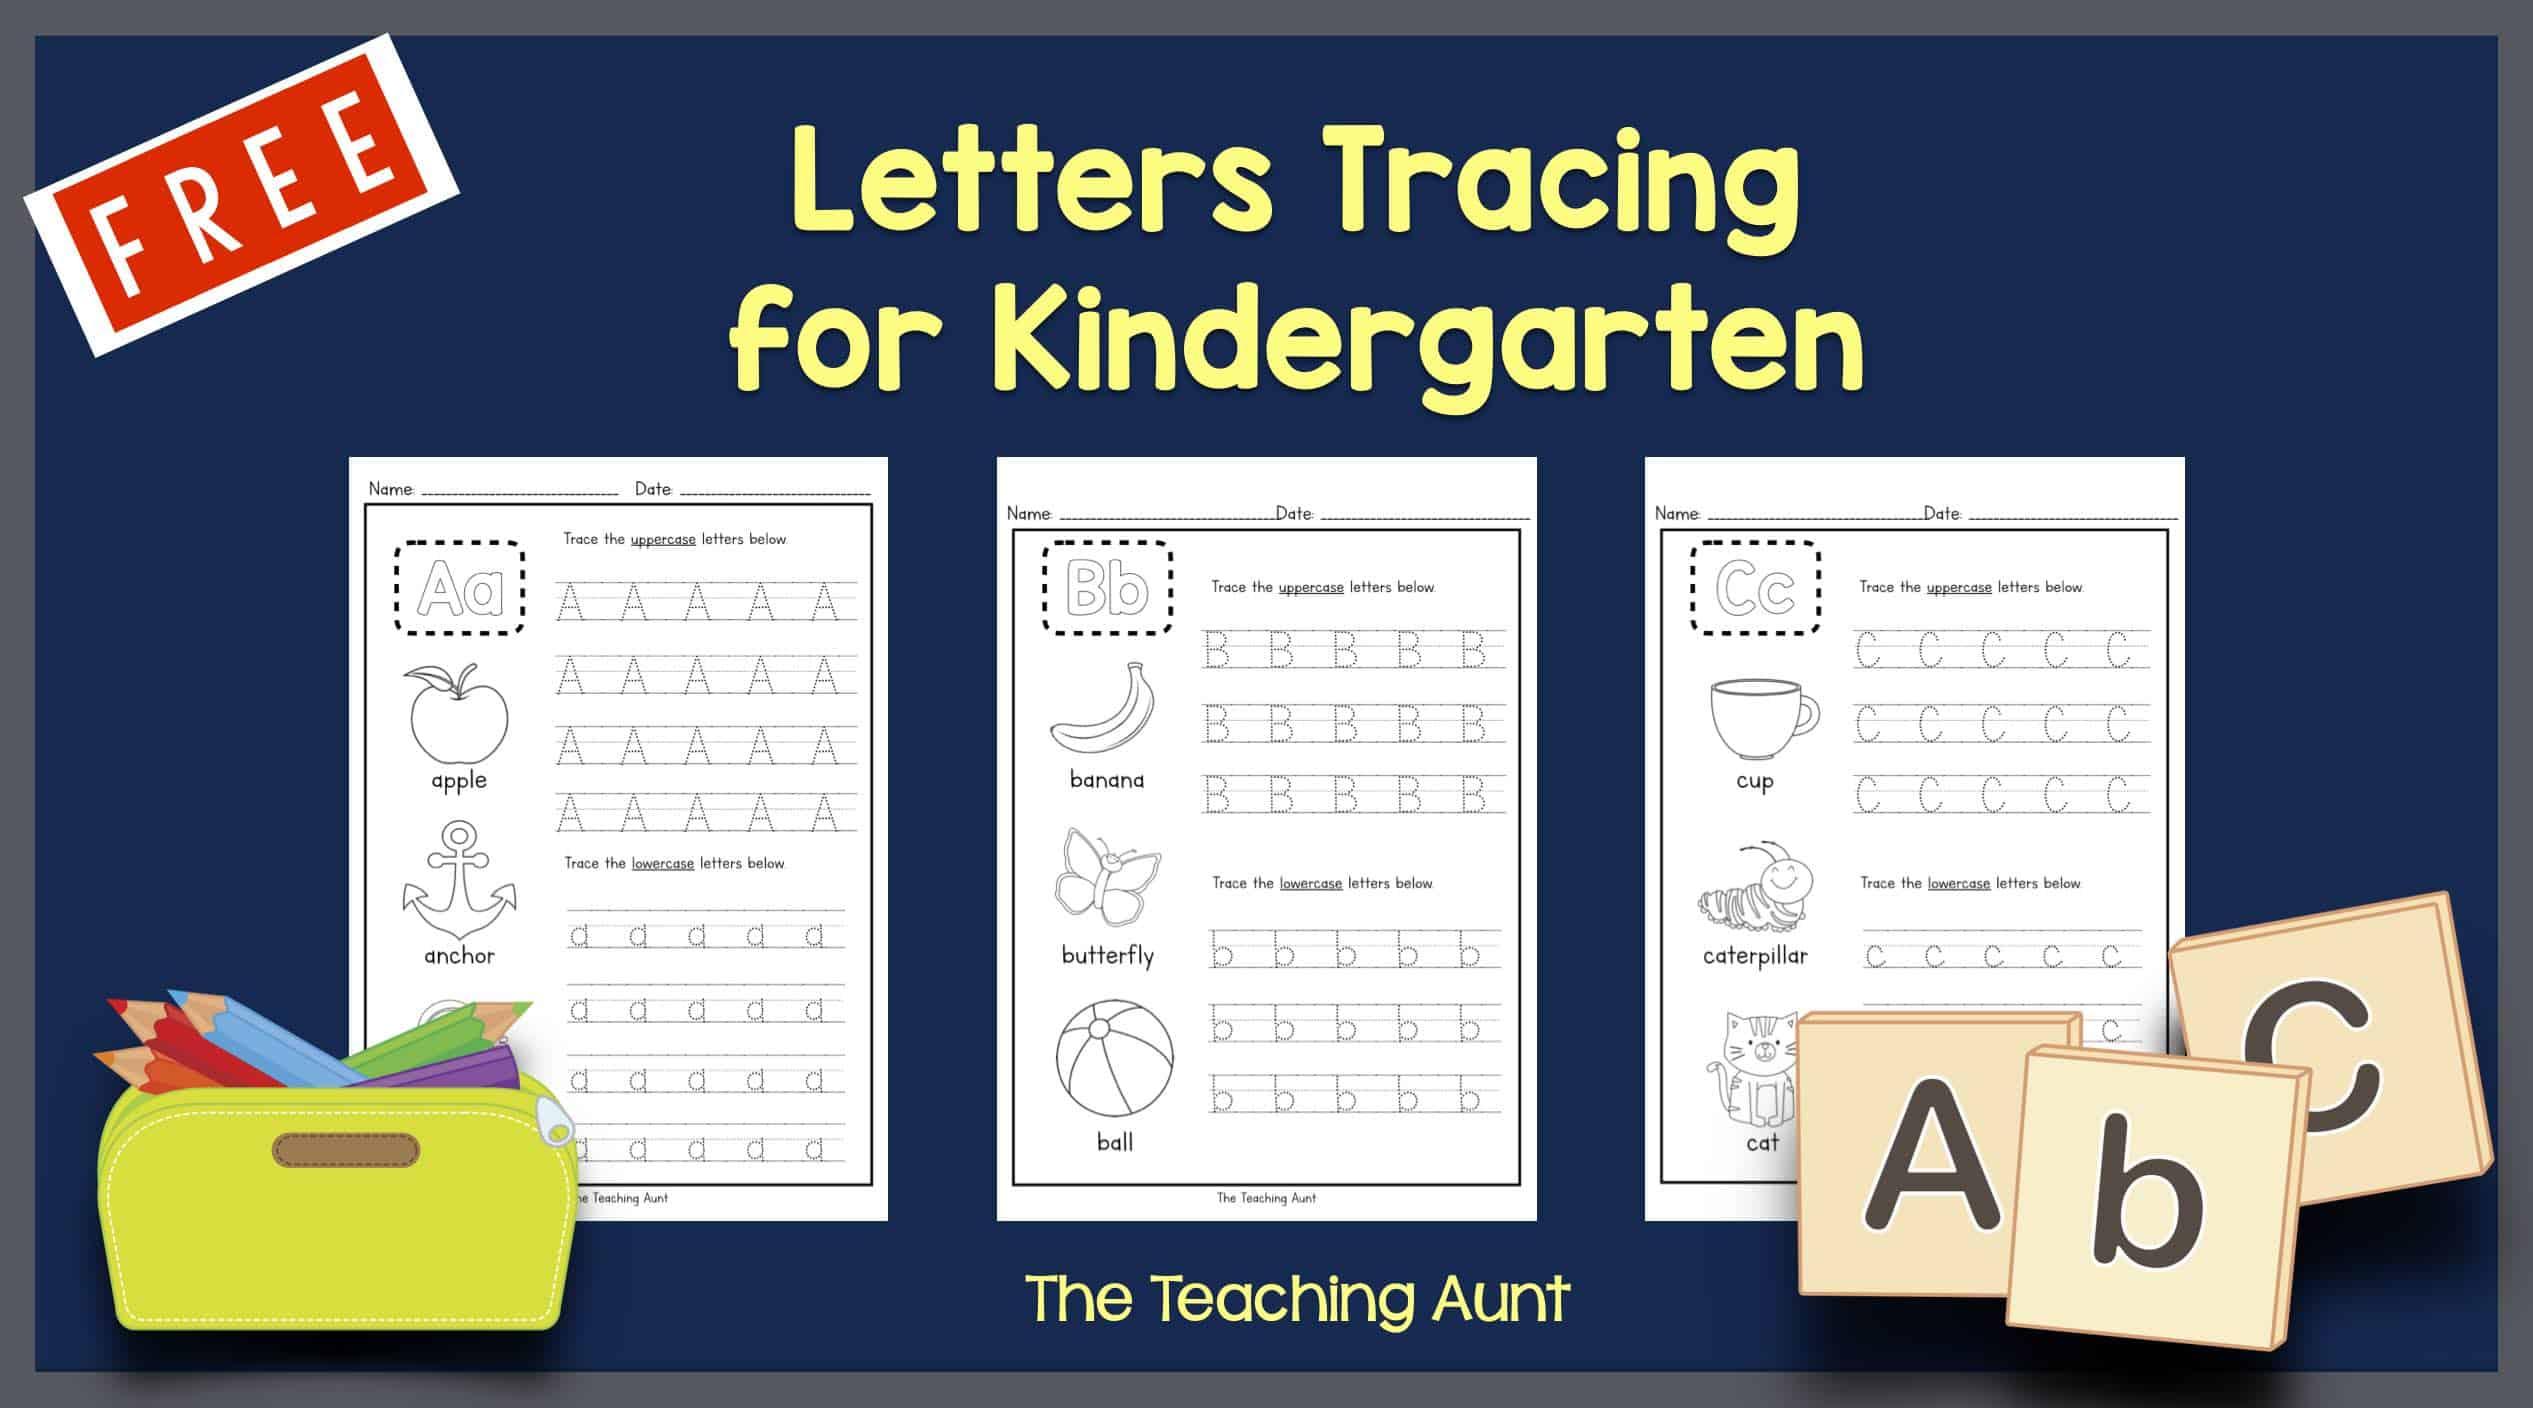 Letters Tracing for Kindergarten